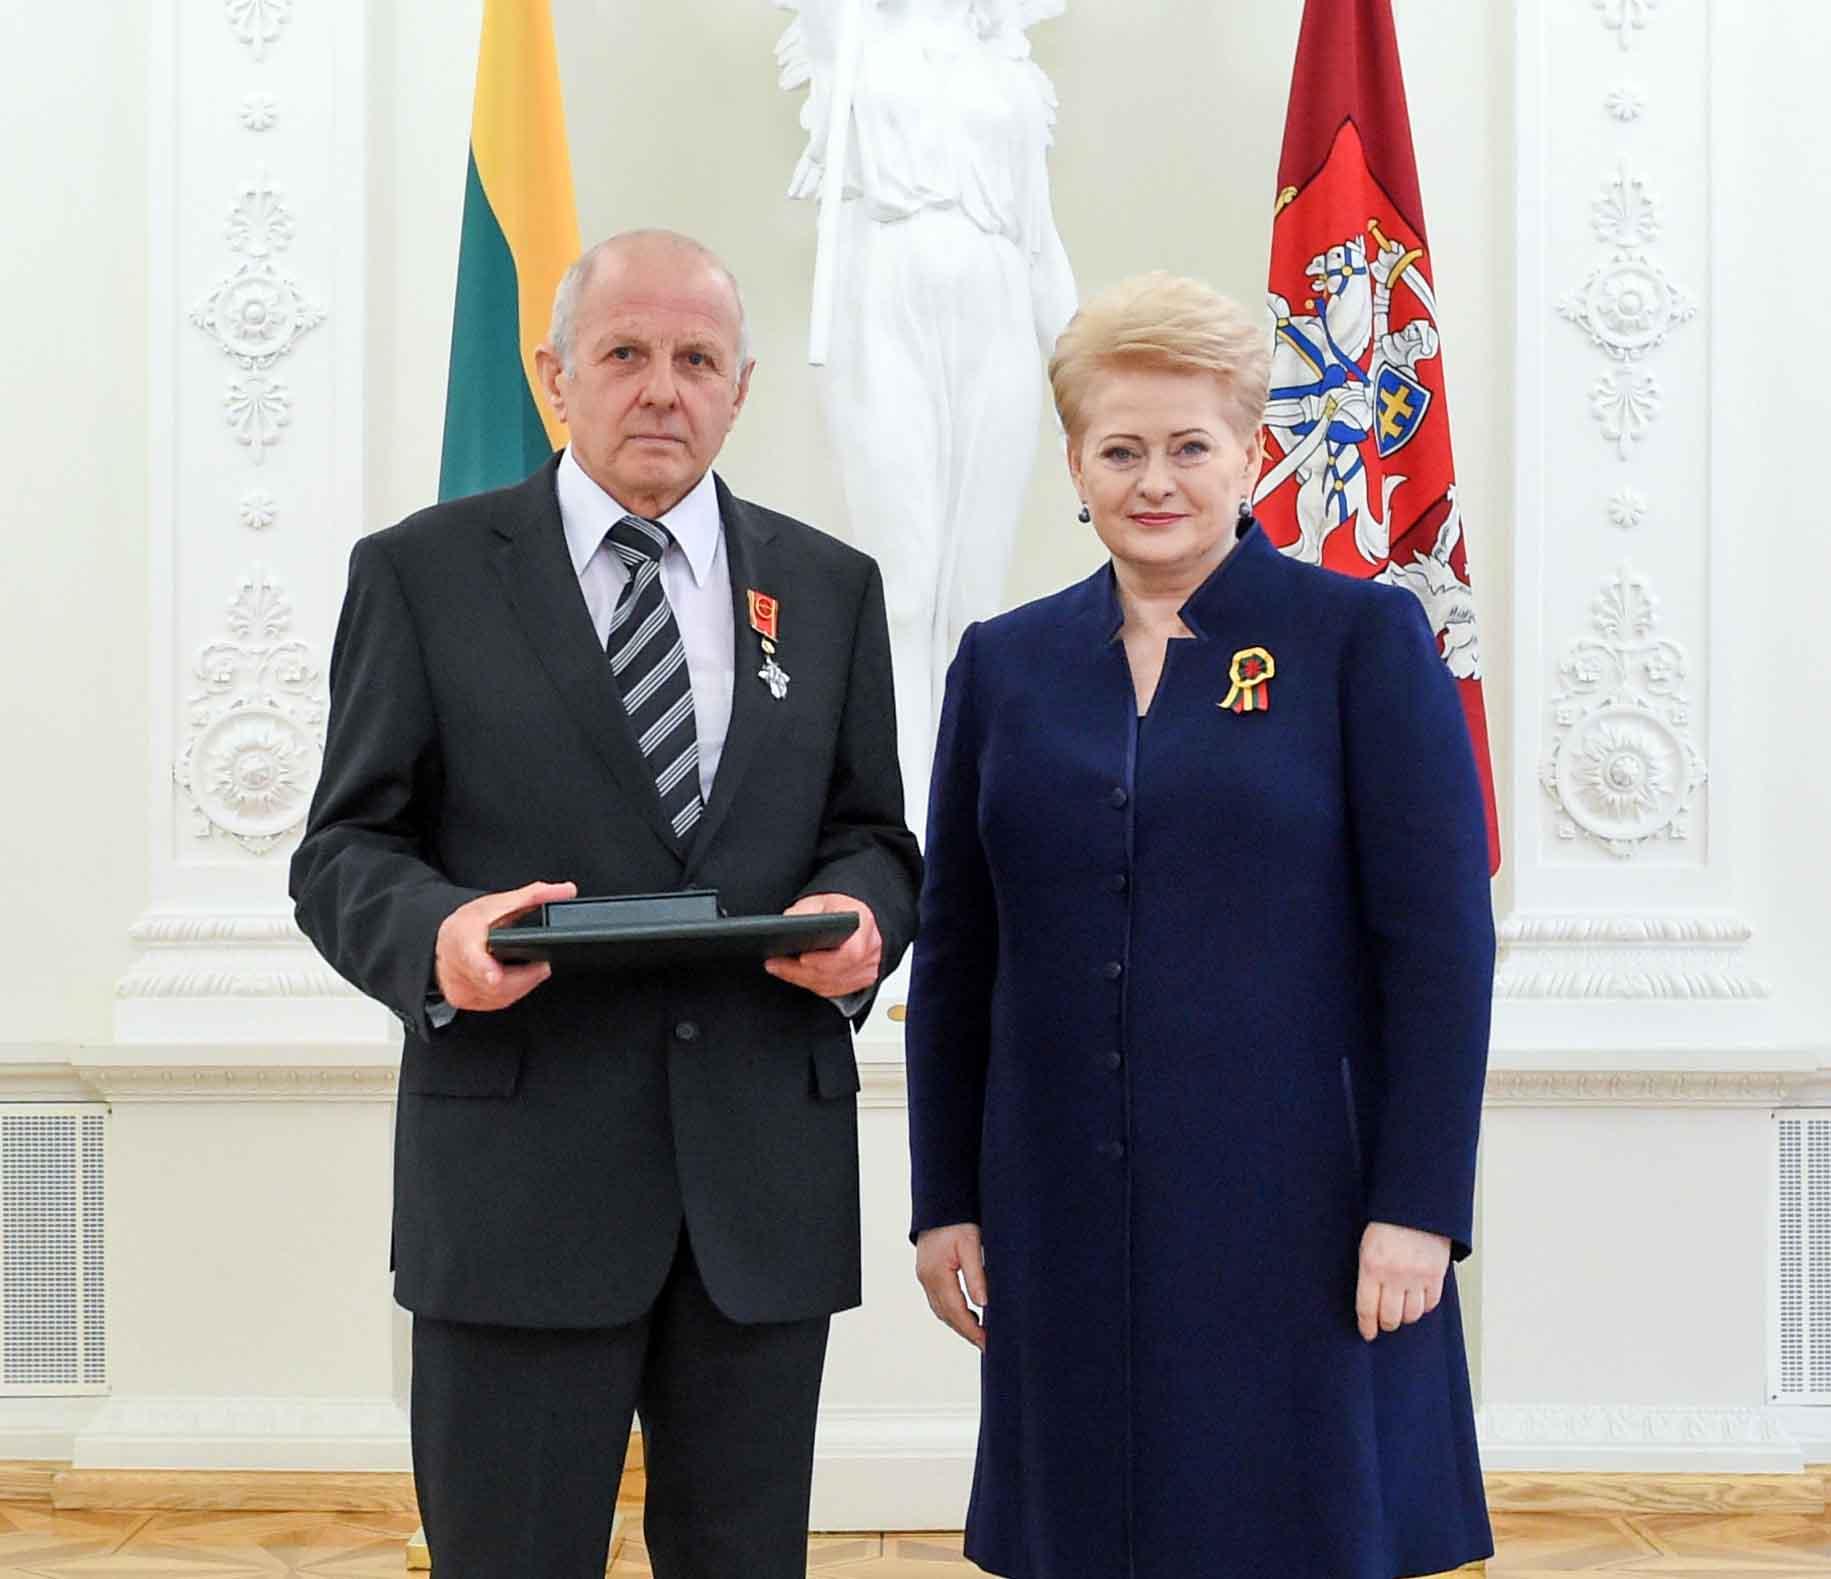 Habil. dr. Kazimieras Garšva ir Lietuvos Respublikos Prezidentė Dalia Grybauskaitė, 2016 liepos 6 d. | lrp.lt, R. Dačkaus nuotr.